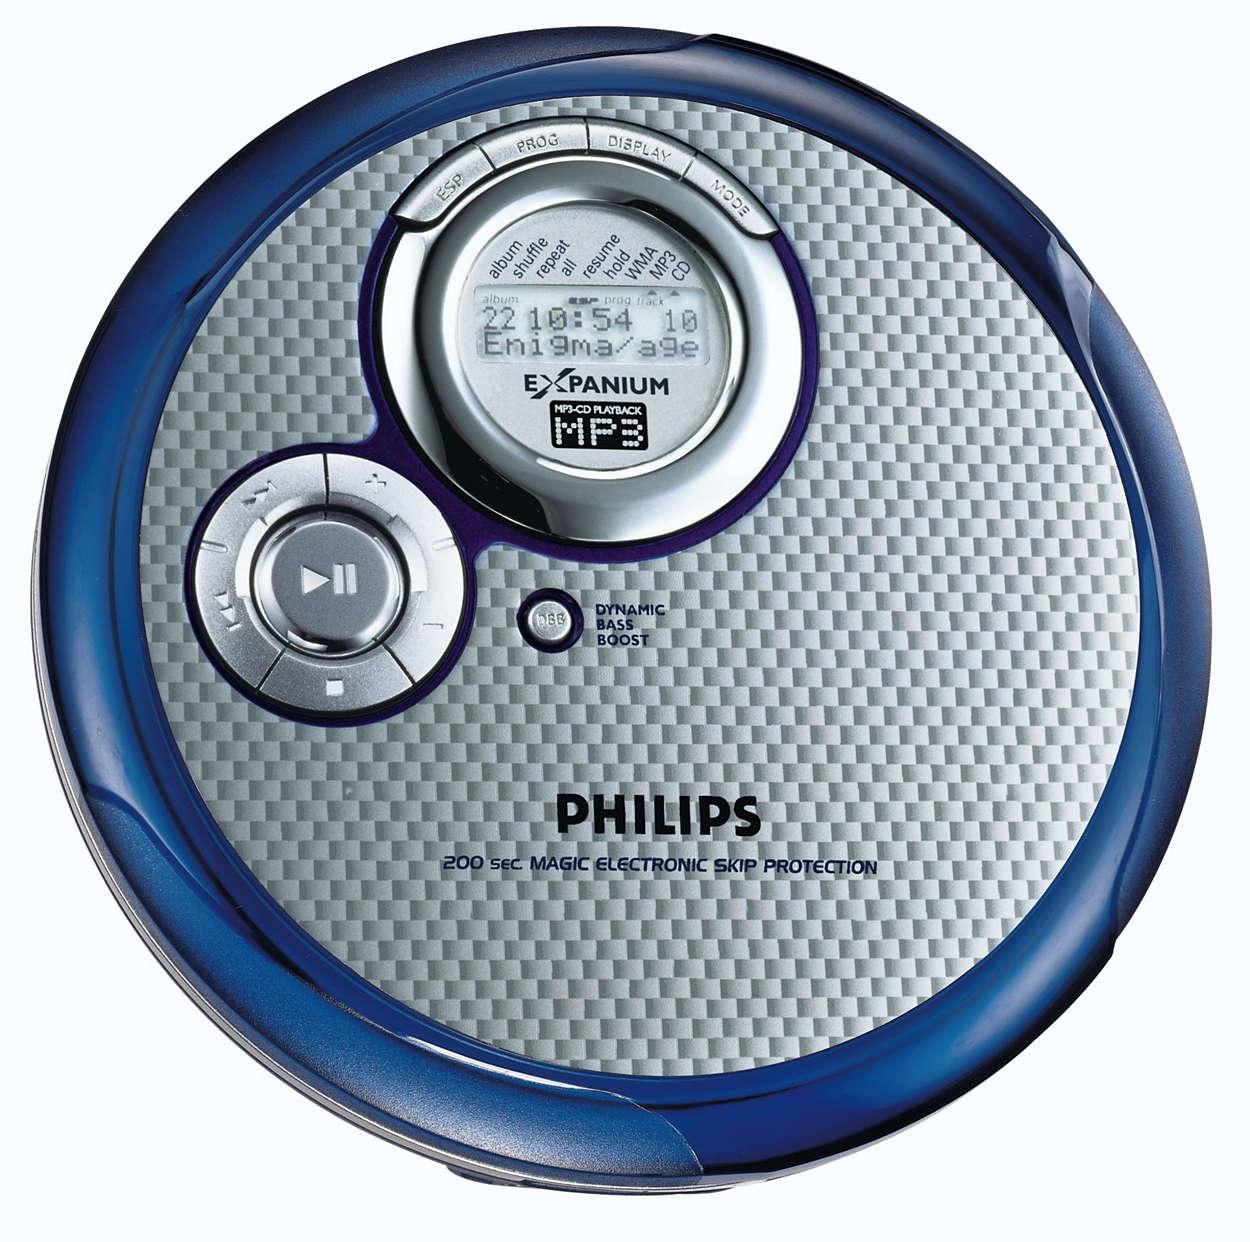 Leitor de CD MP3 elegante